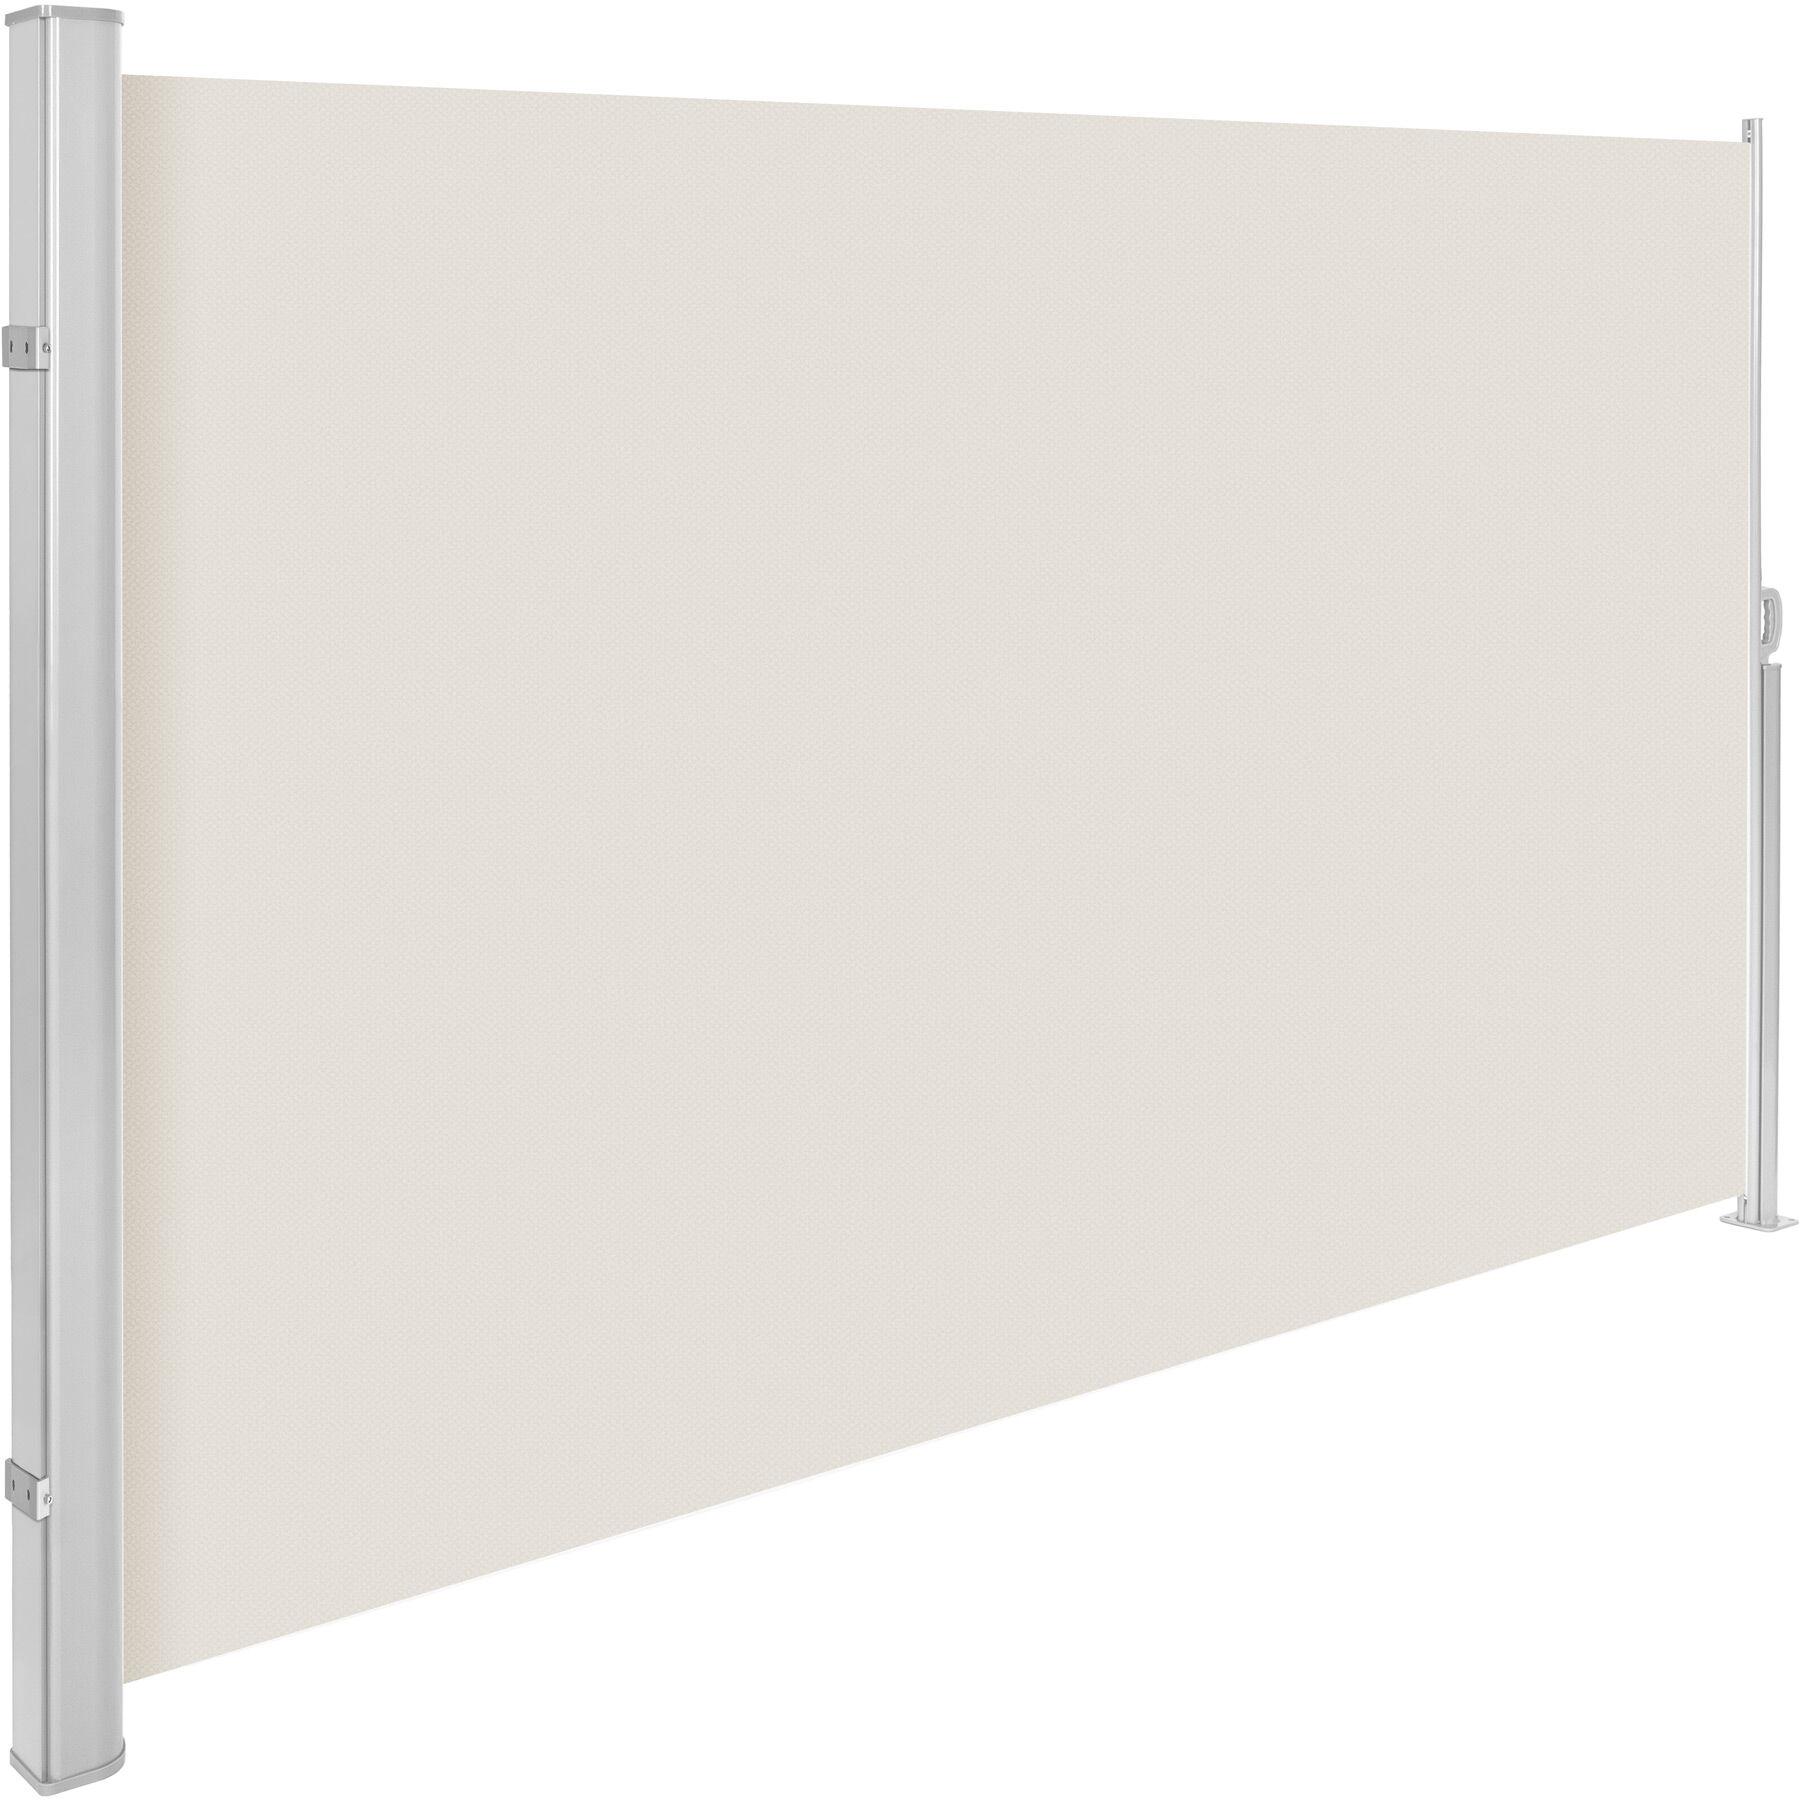 tectake Læhegn i aluminium og polyester - beige, 160 x 300 cm